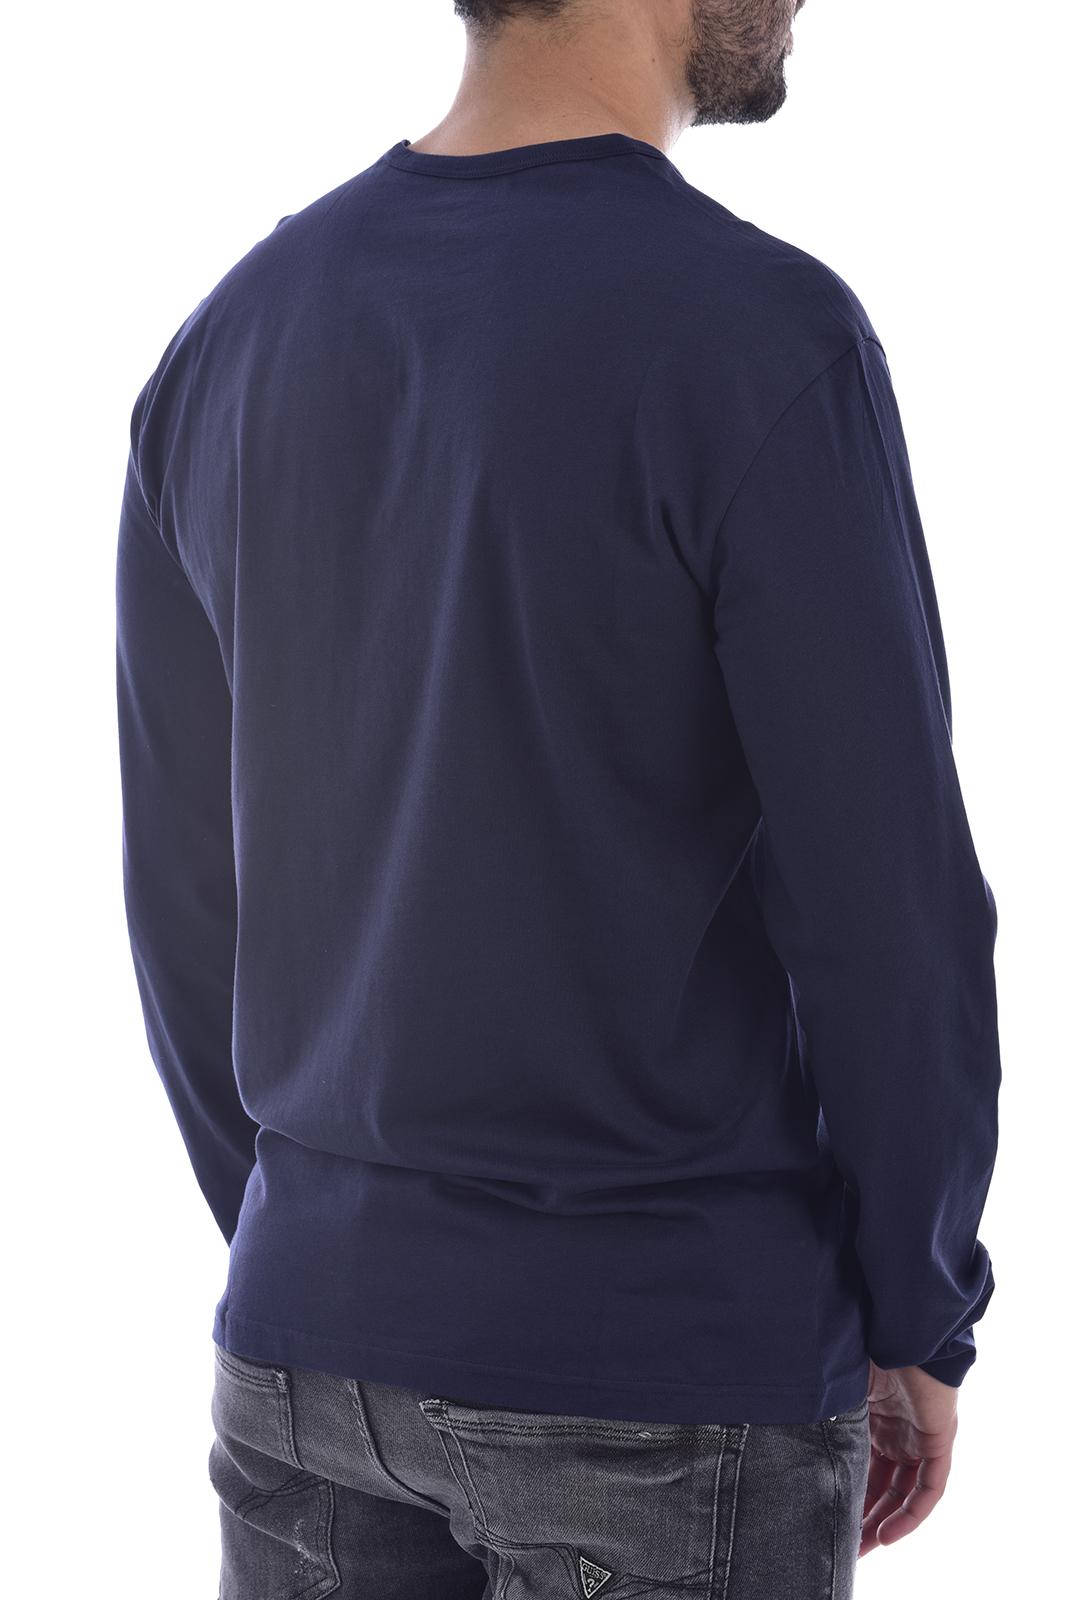 Tee-shirts  Emporio armani 111653 0A722 00135 BLUE